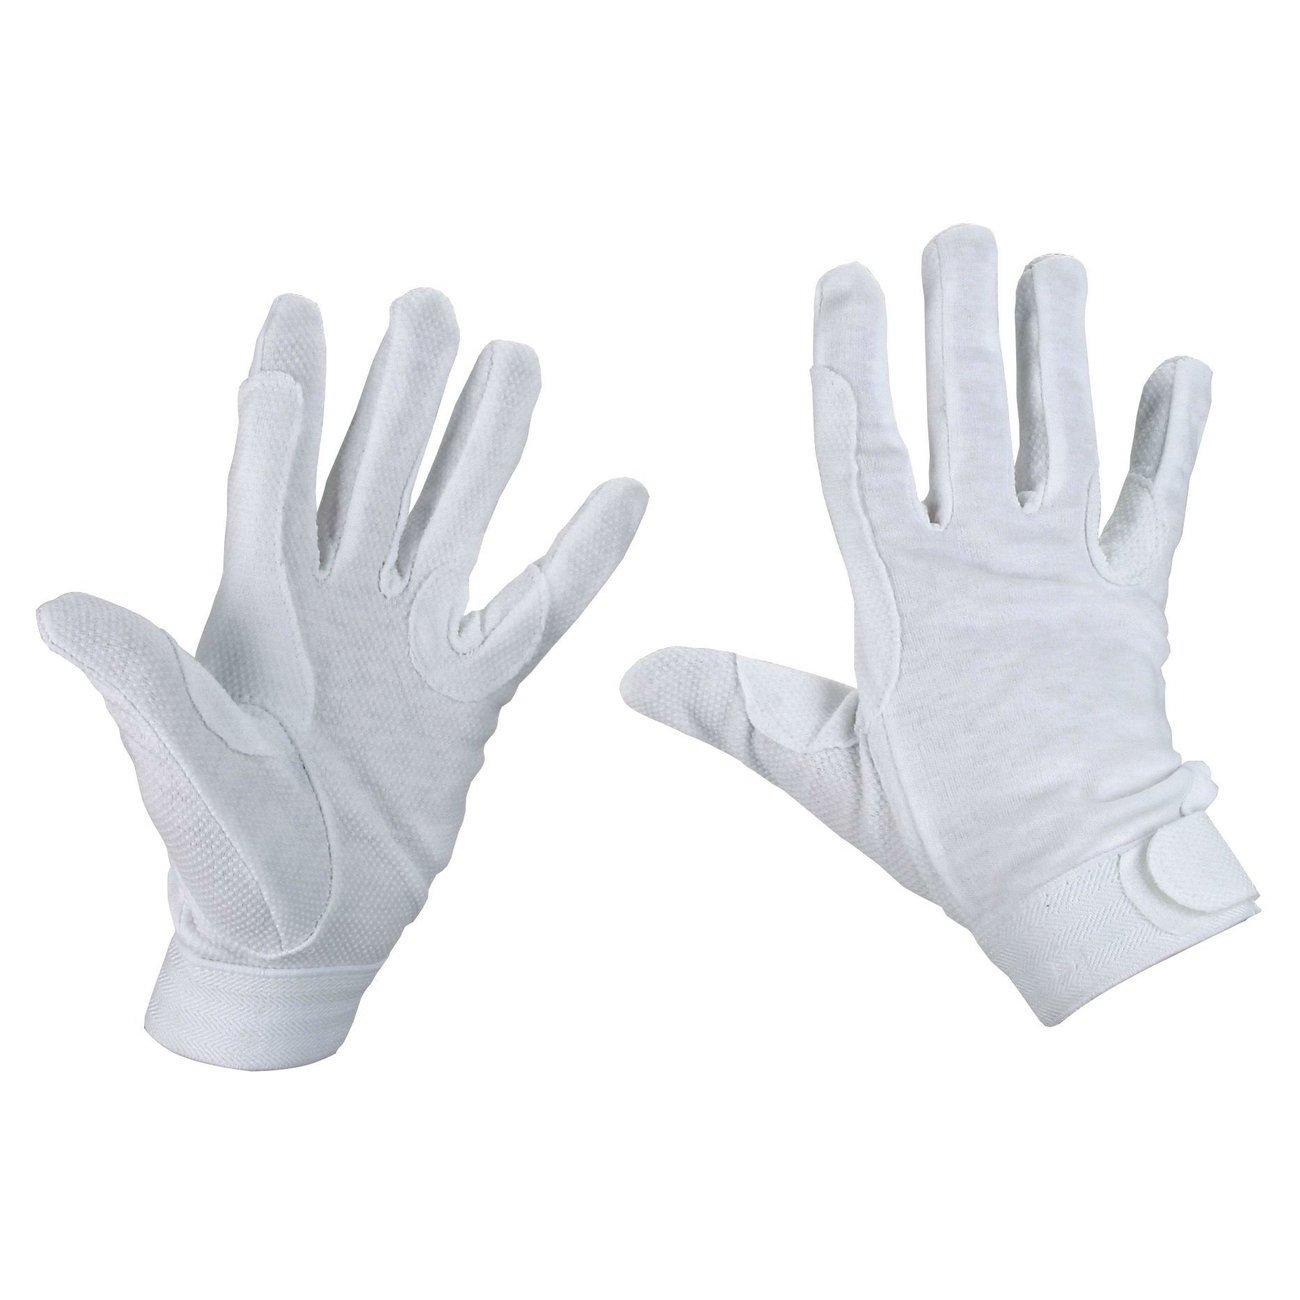 Kerbl Jersey Turnier Reit Handschuhe, Gr. XS